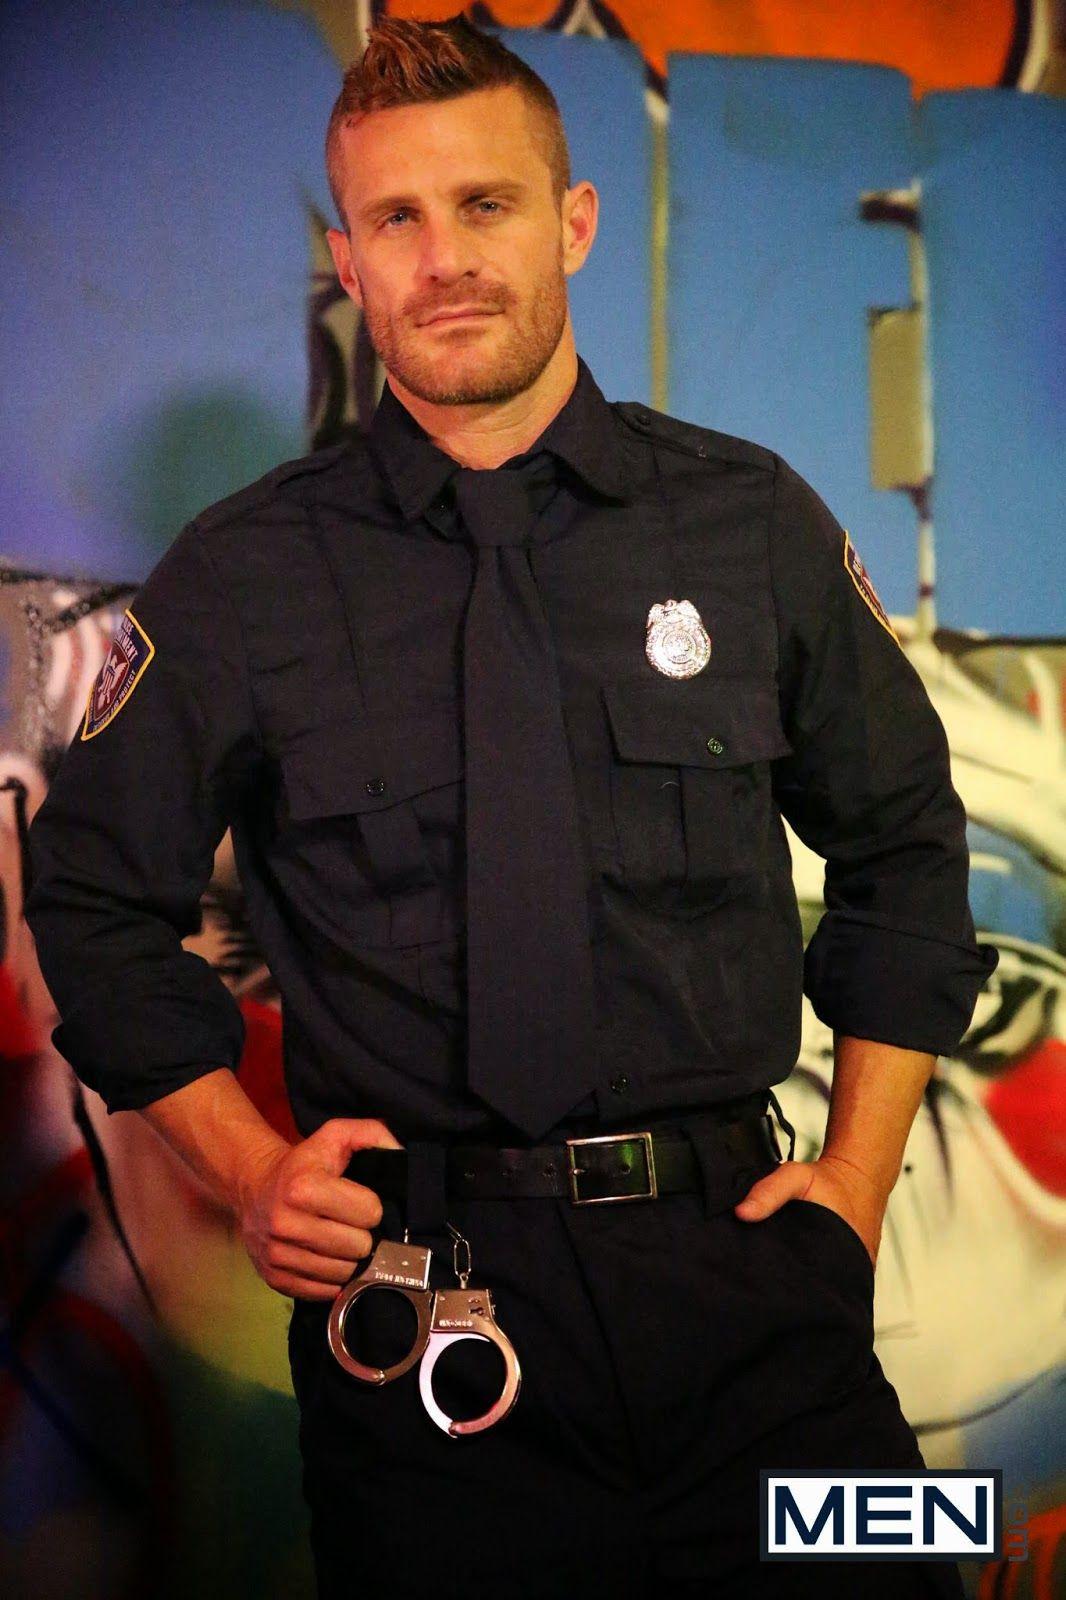 Landon Conrad  Hot Cops, Cop Arrested, Men In Uniform-5051